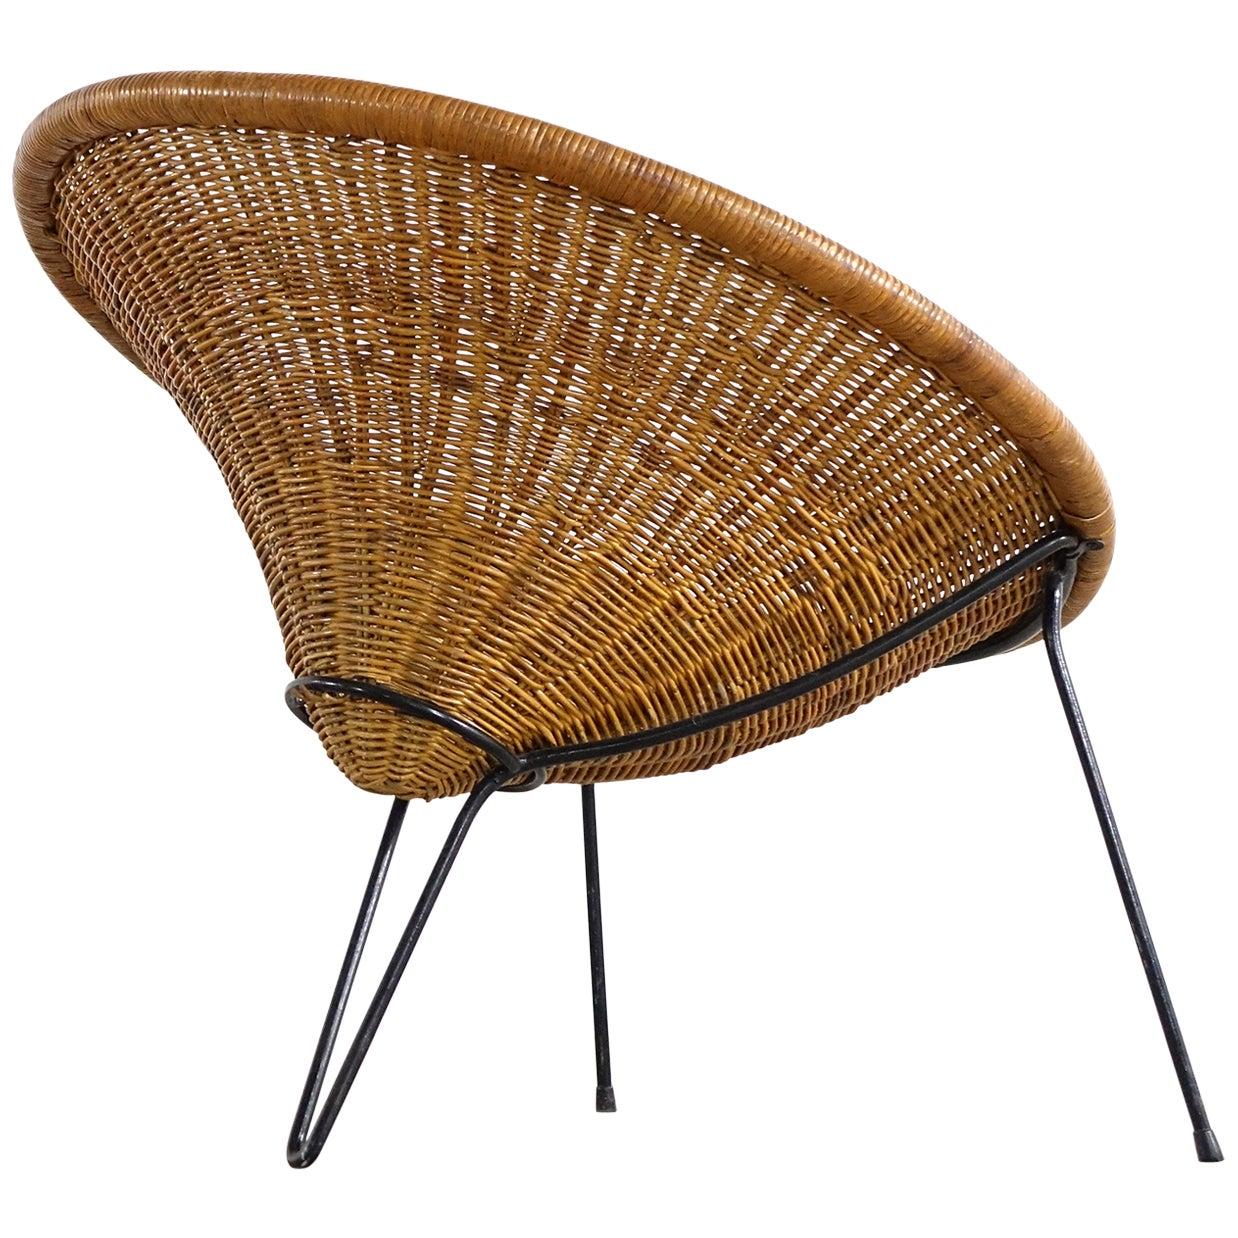 Tripod Rattan Lounge Chair Attributed to Roberto Mango, Italy, 1952